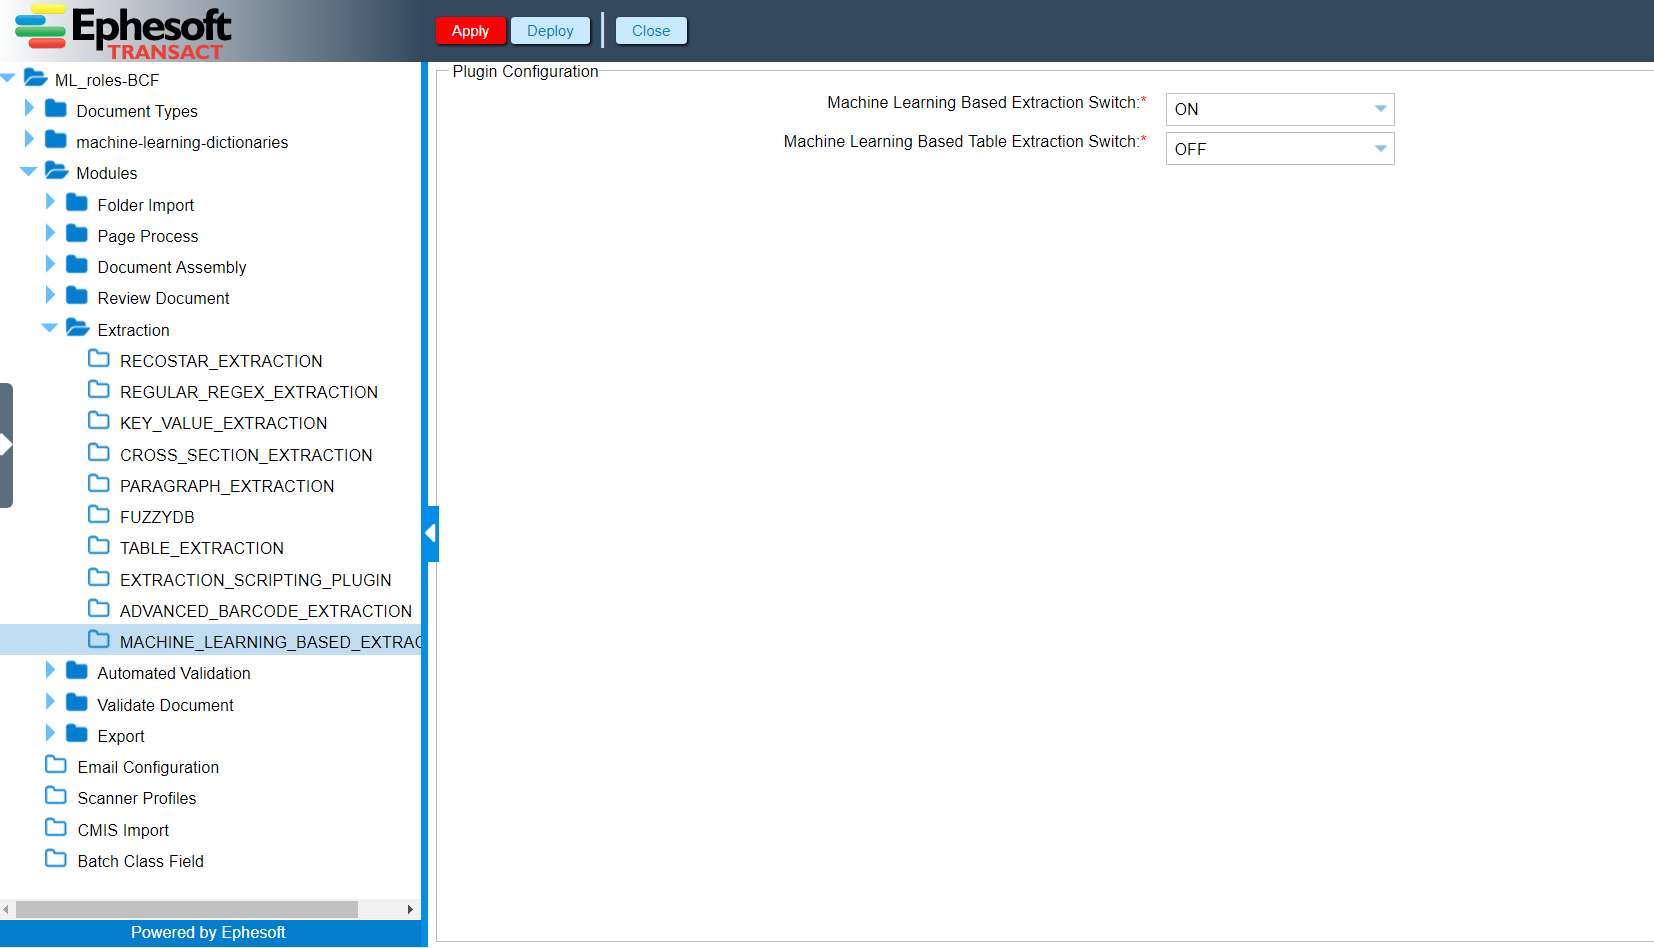 C:\Users\Ephesoft\AppData\Local\Microsoft\Windows\INetCache\Content.Word\MLroles5.png